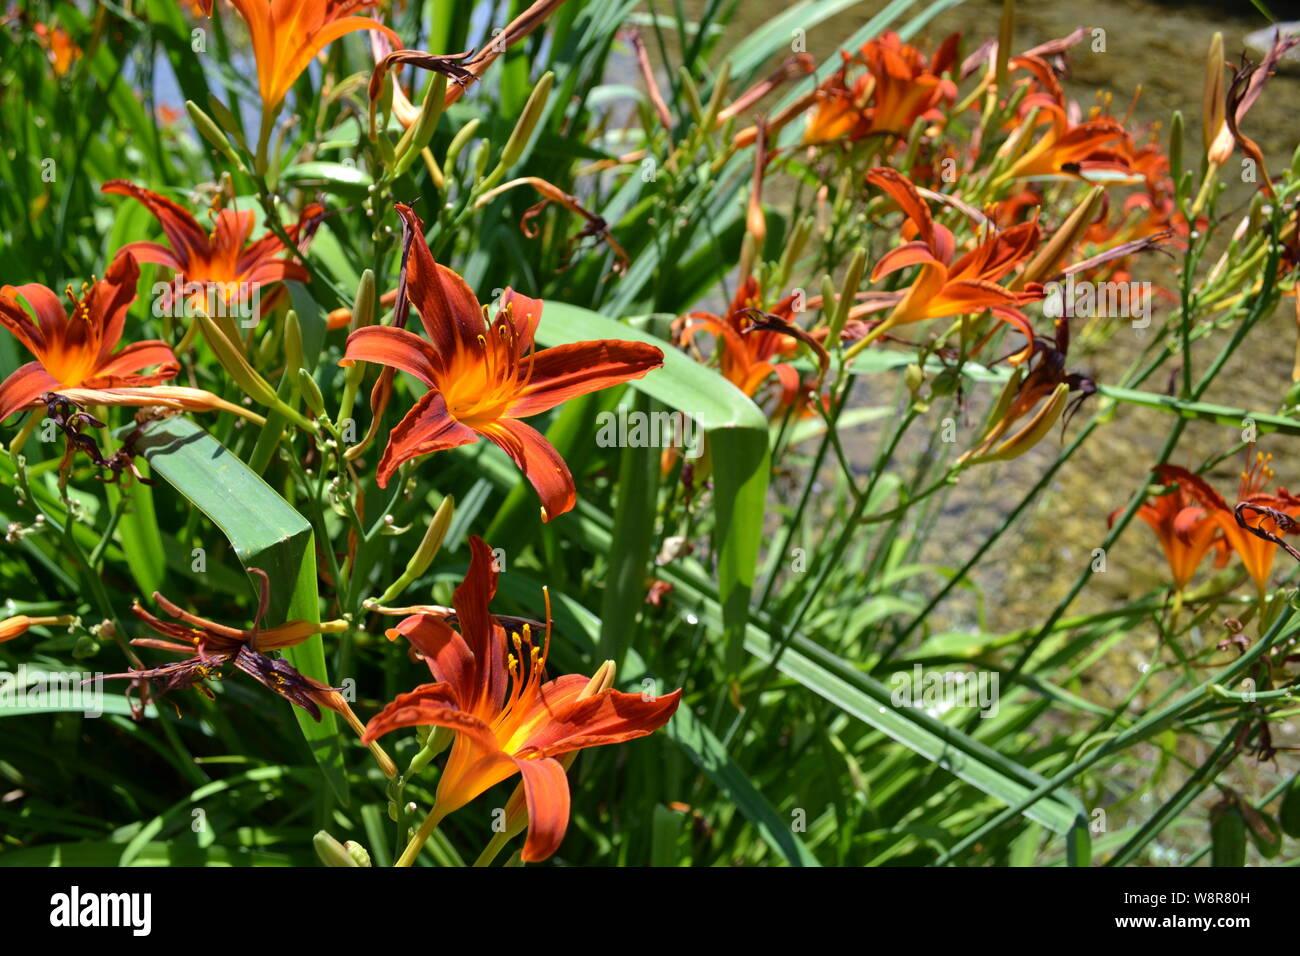 Beautiful orange daylily hemerocallis fulva flowers growing at mountain stream in a sunny summer day. Stock Photo